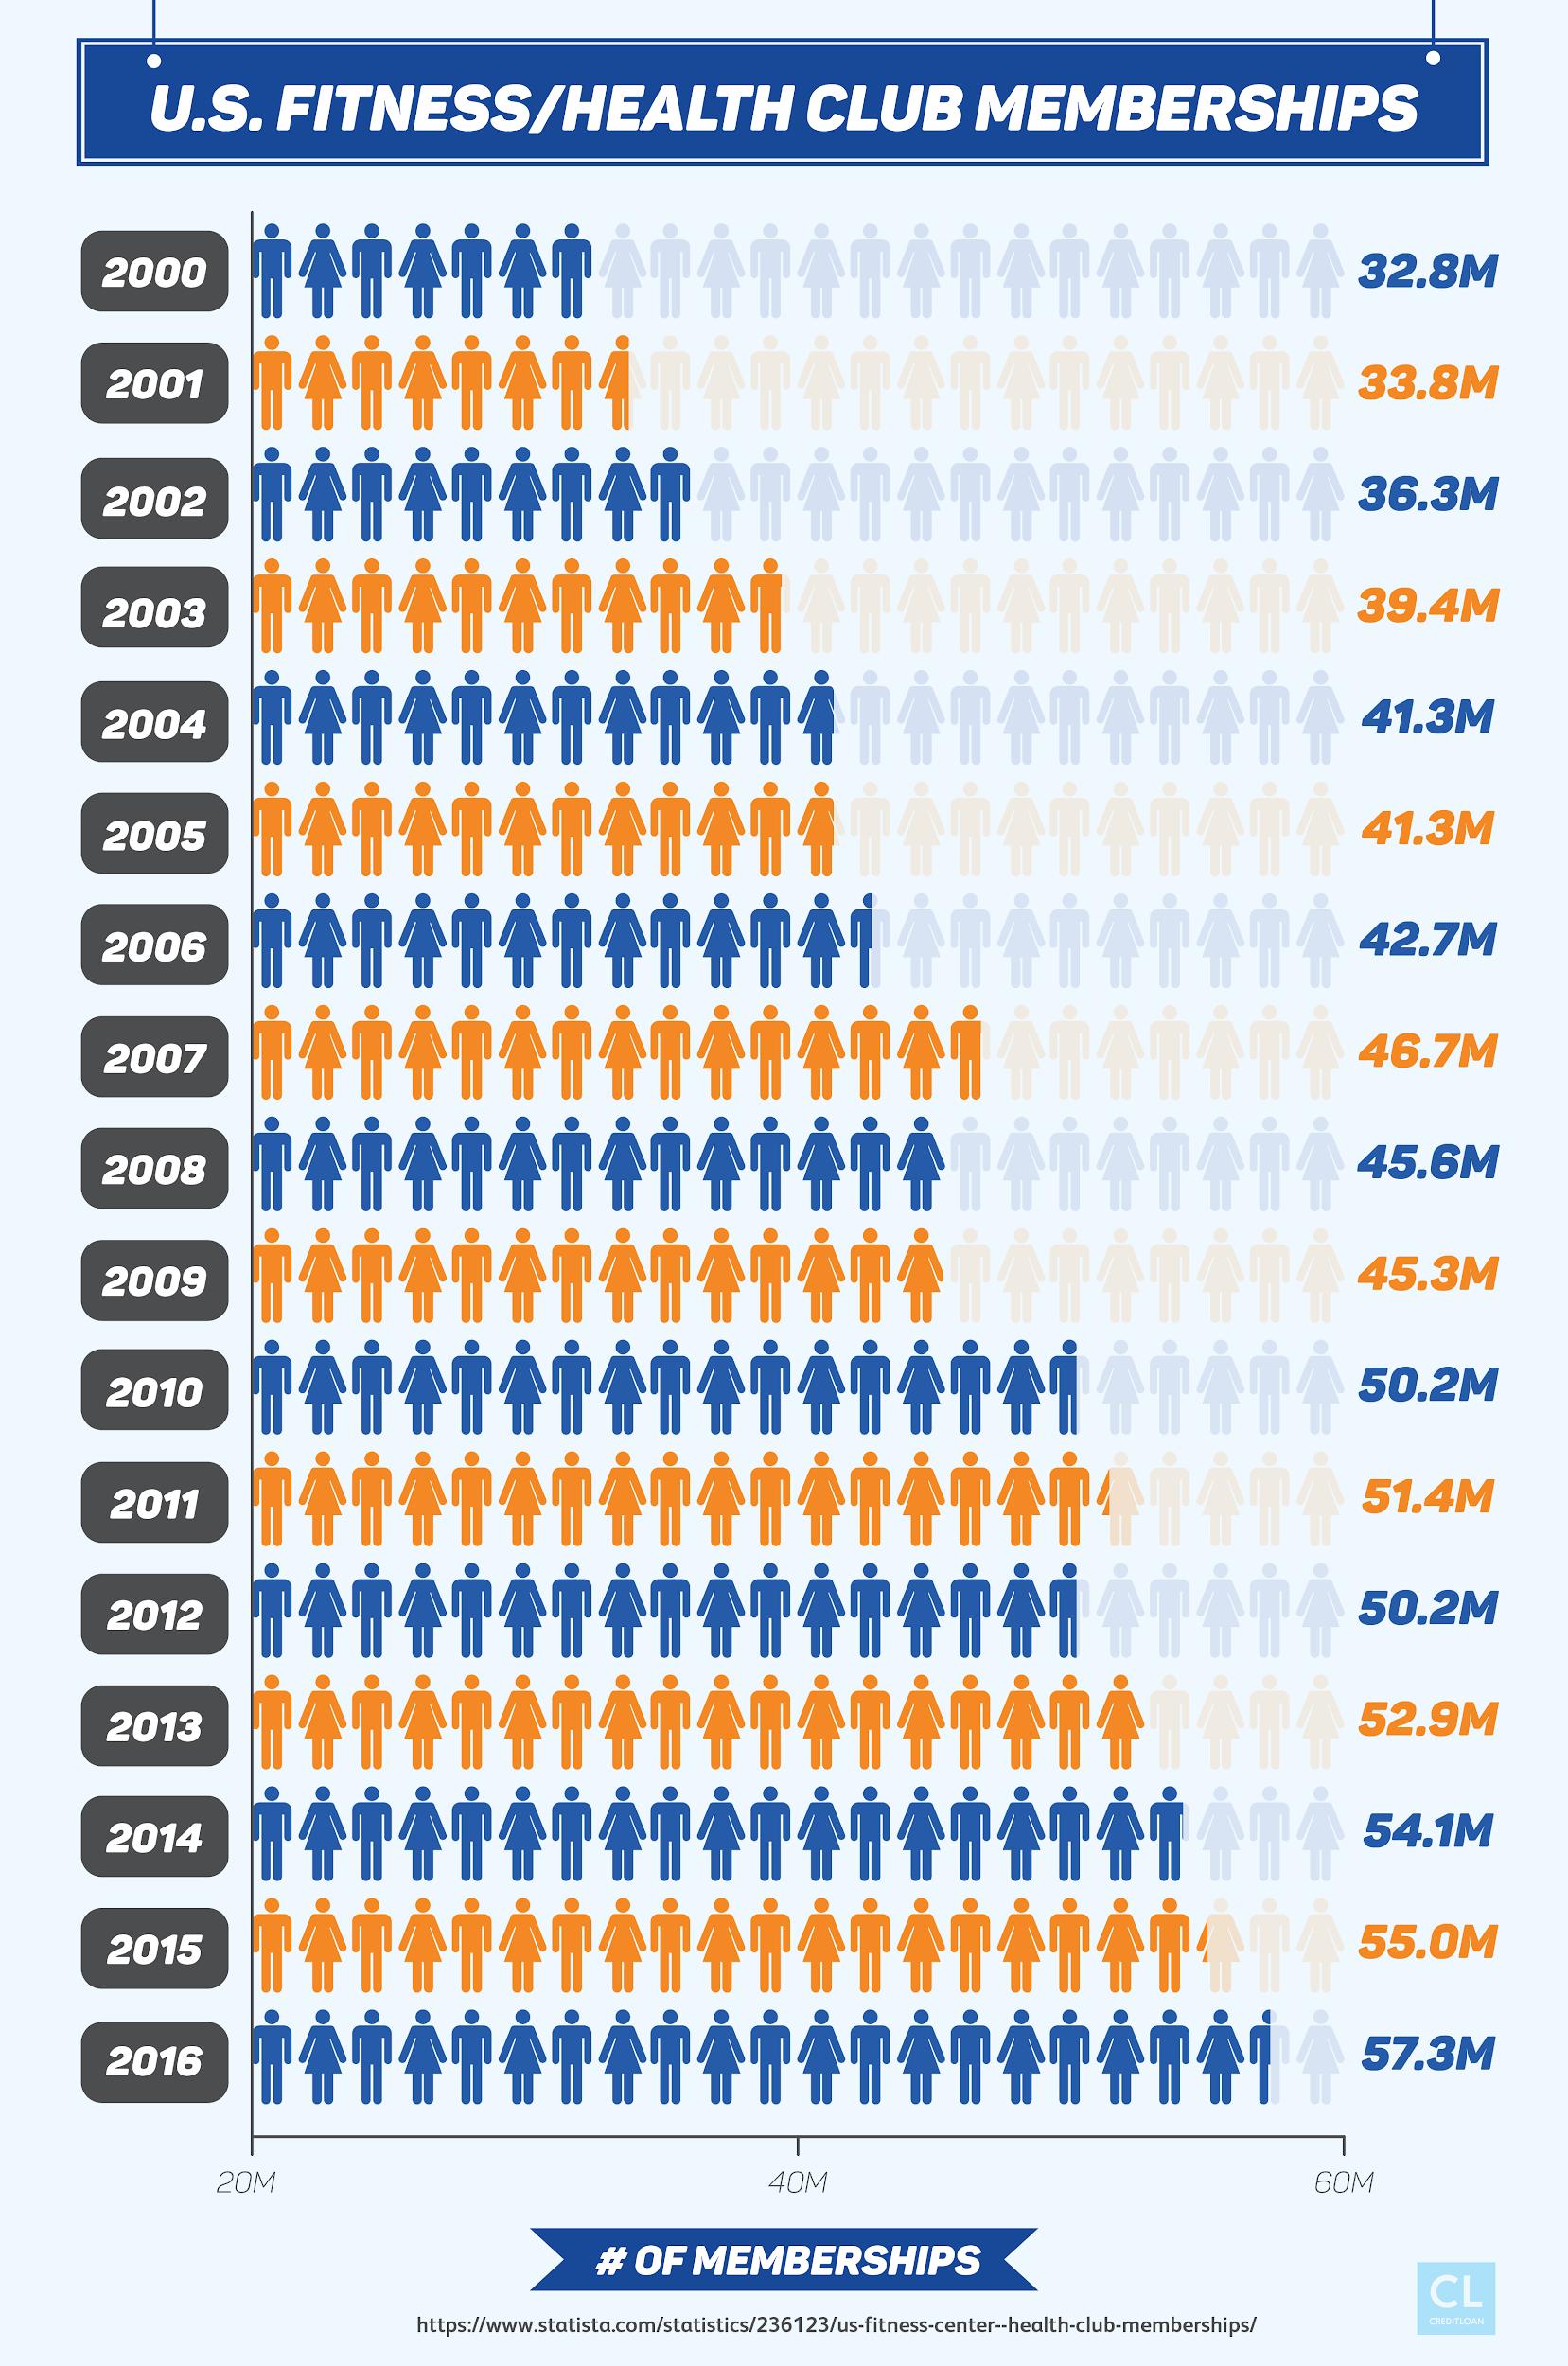 U.S. Fitness/Health Club Memberships from 2000-2016